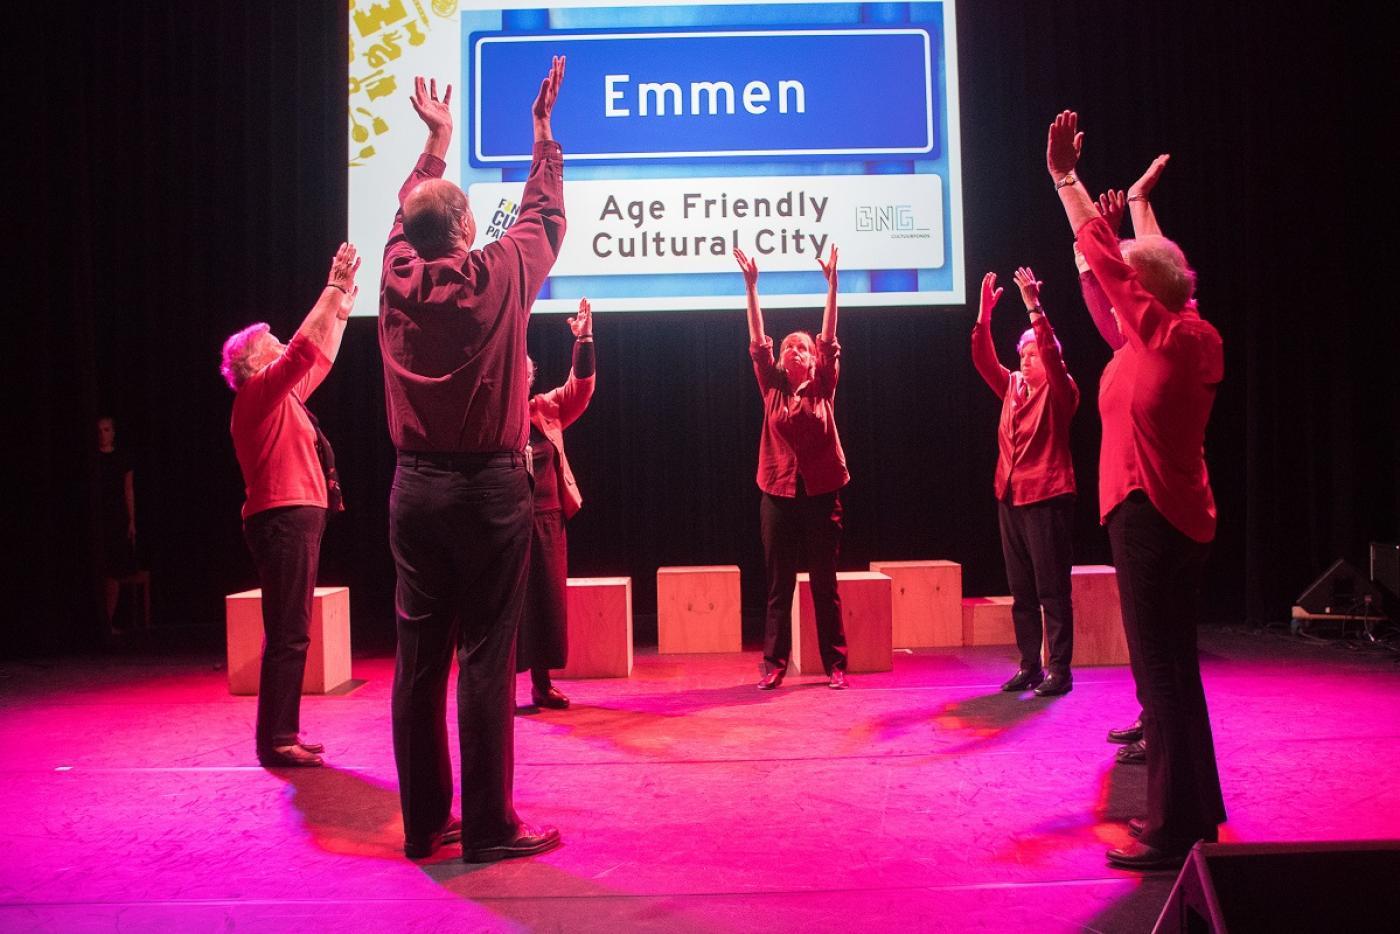 Ouderen uit Age Friendly Cultural Emmen dansen